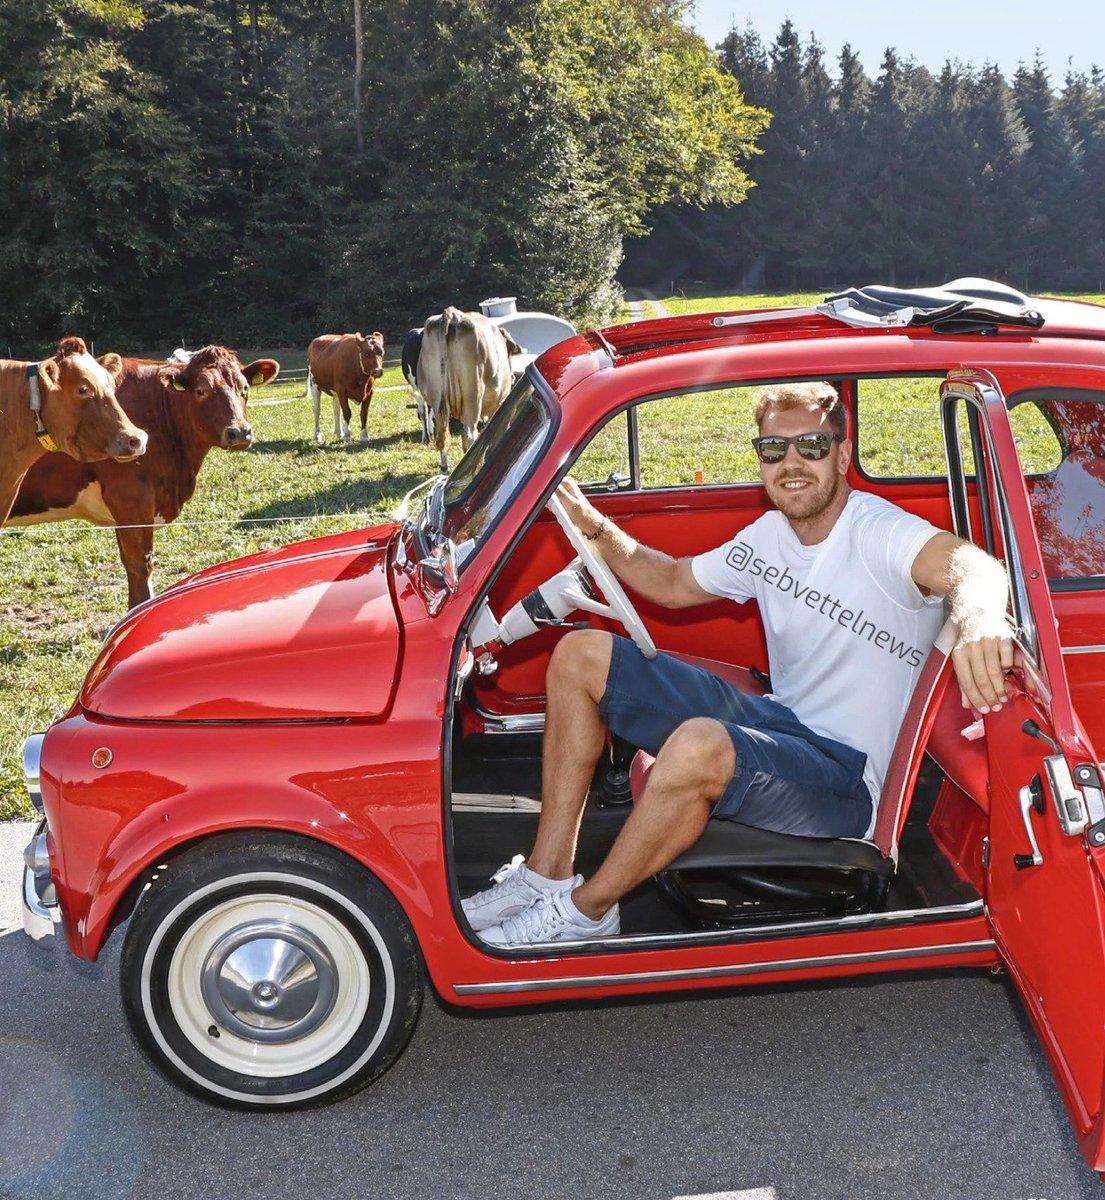 Sebastian Vettel with his vintage red Fiat 500 🚗   #Seb5 #F1